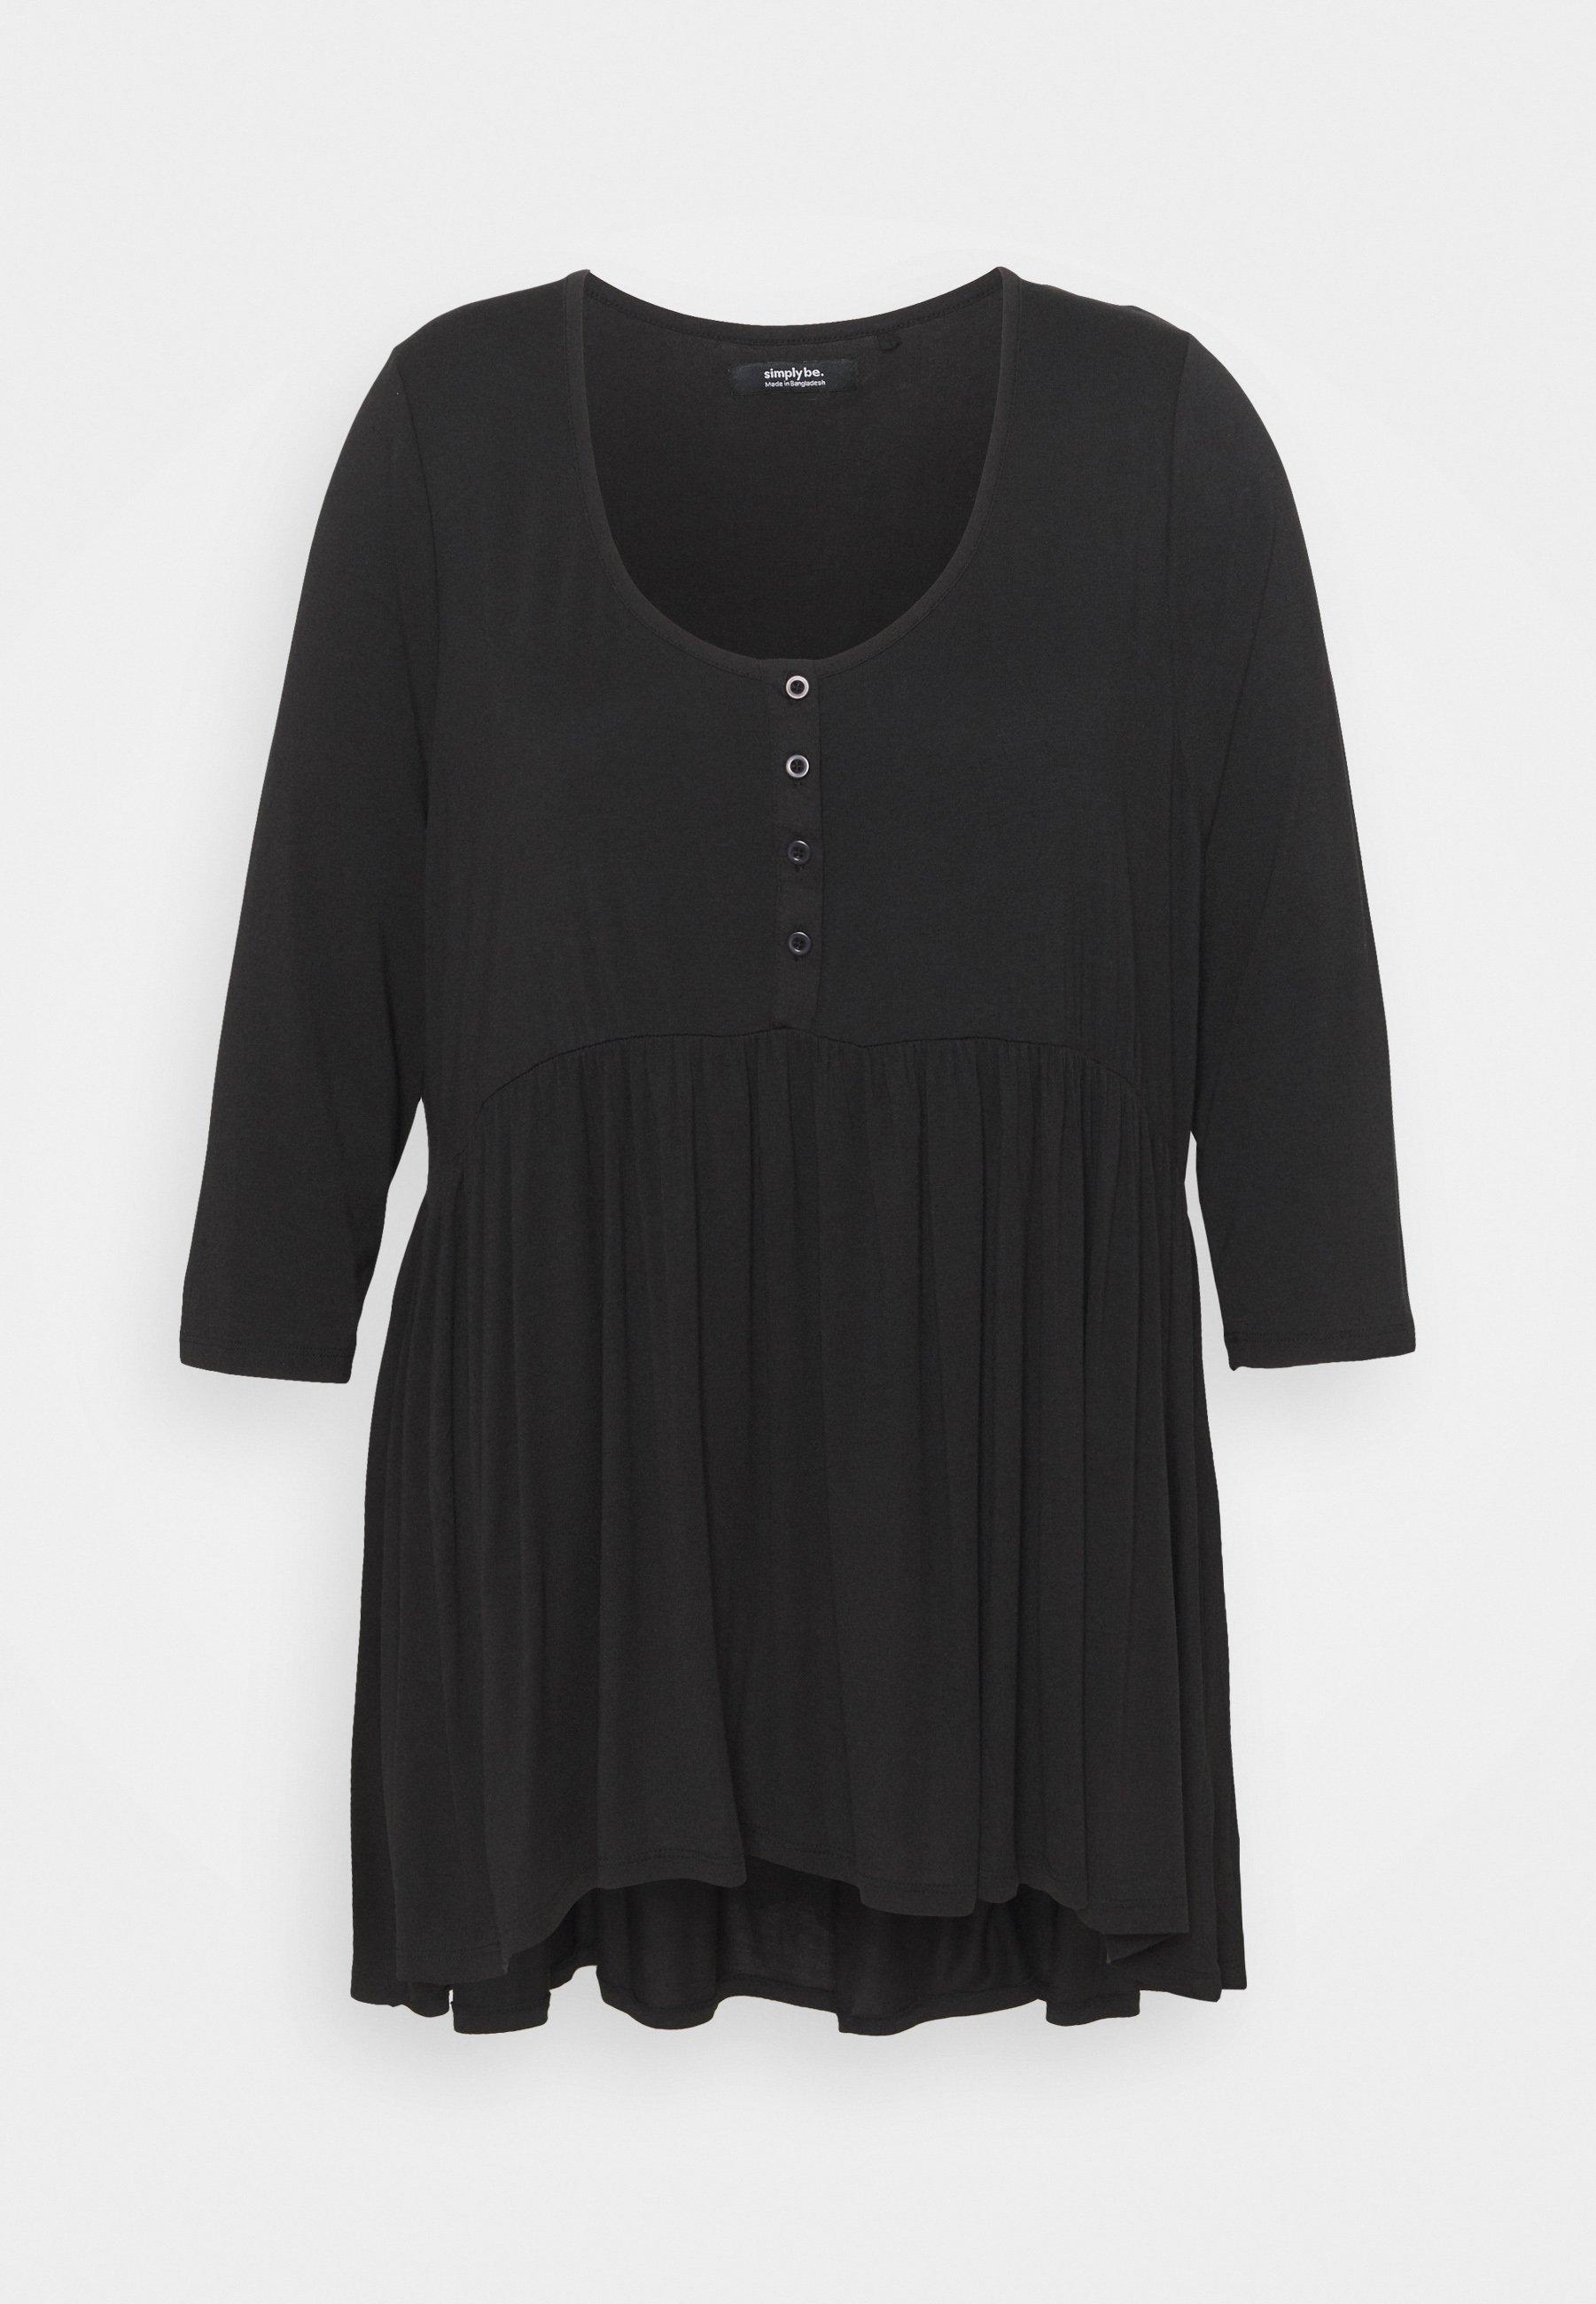 Femme SLEEVE BUTTON DOWN TUNIC - T-shirt à manches longues